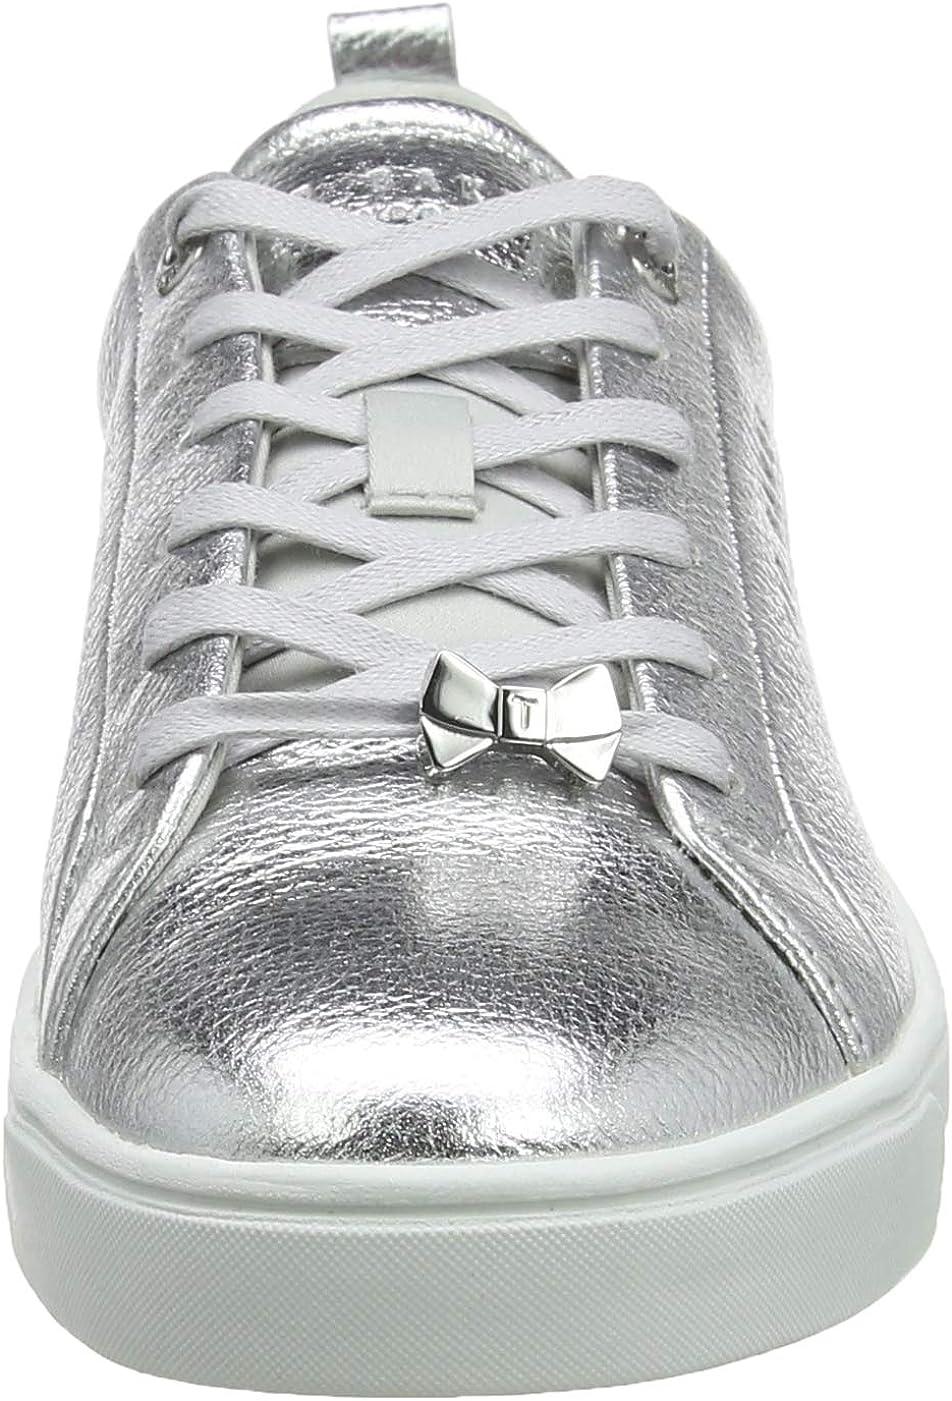 Ted Baker Roullym, Sneaker Donna Rosa Raspberry Ripple Sil Pnk